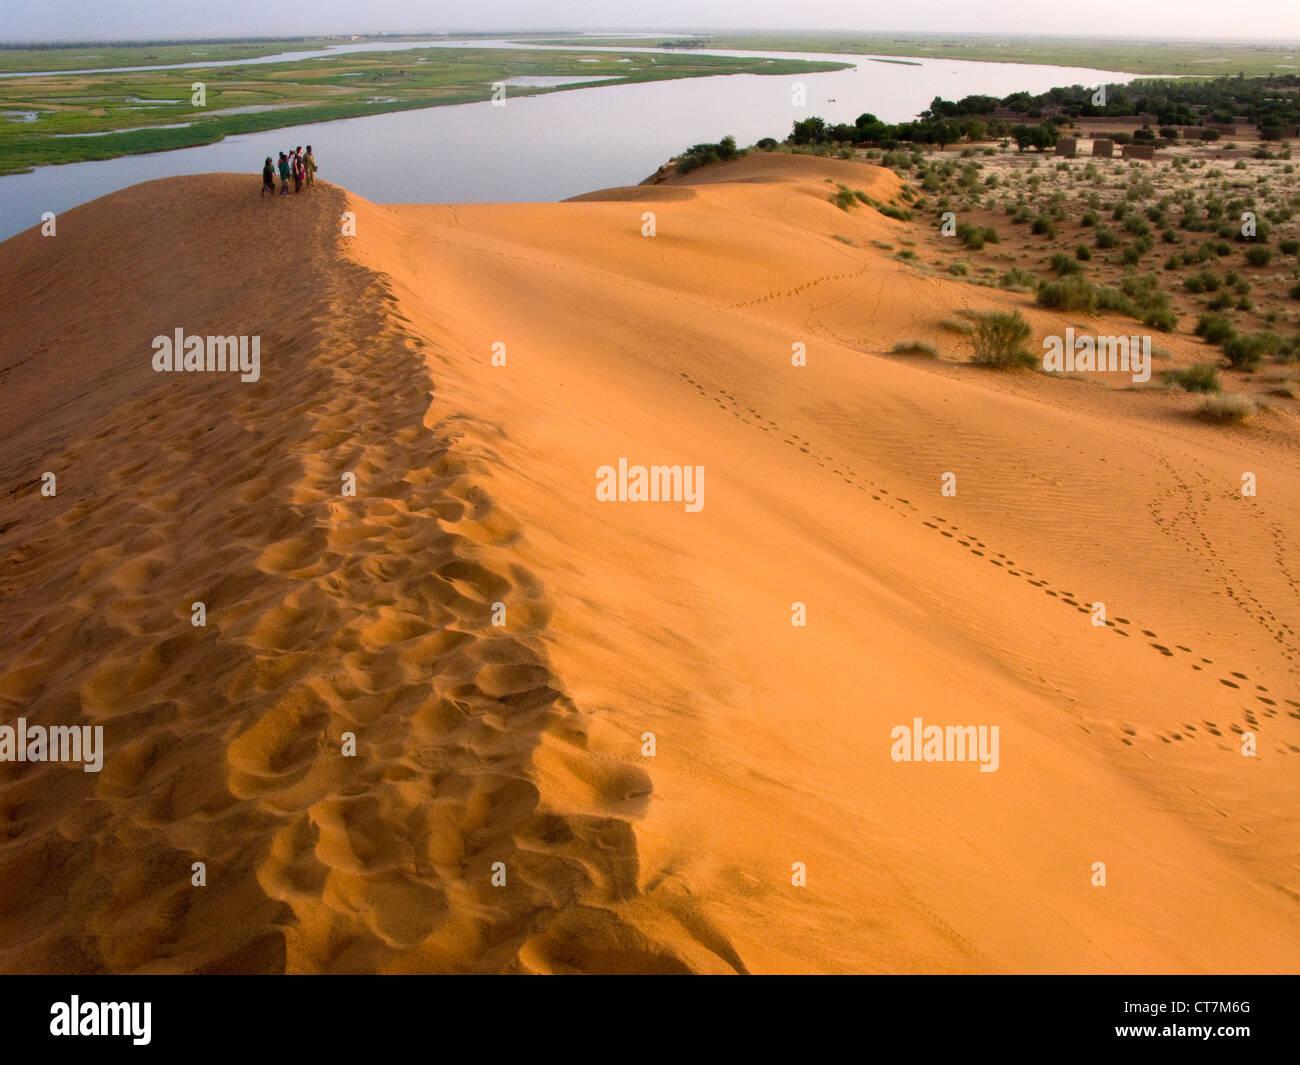 The Dune of Koima ( Dune Rose ) by Niger river, Gao region. Mali .West Africa. - Stock Image